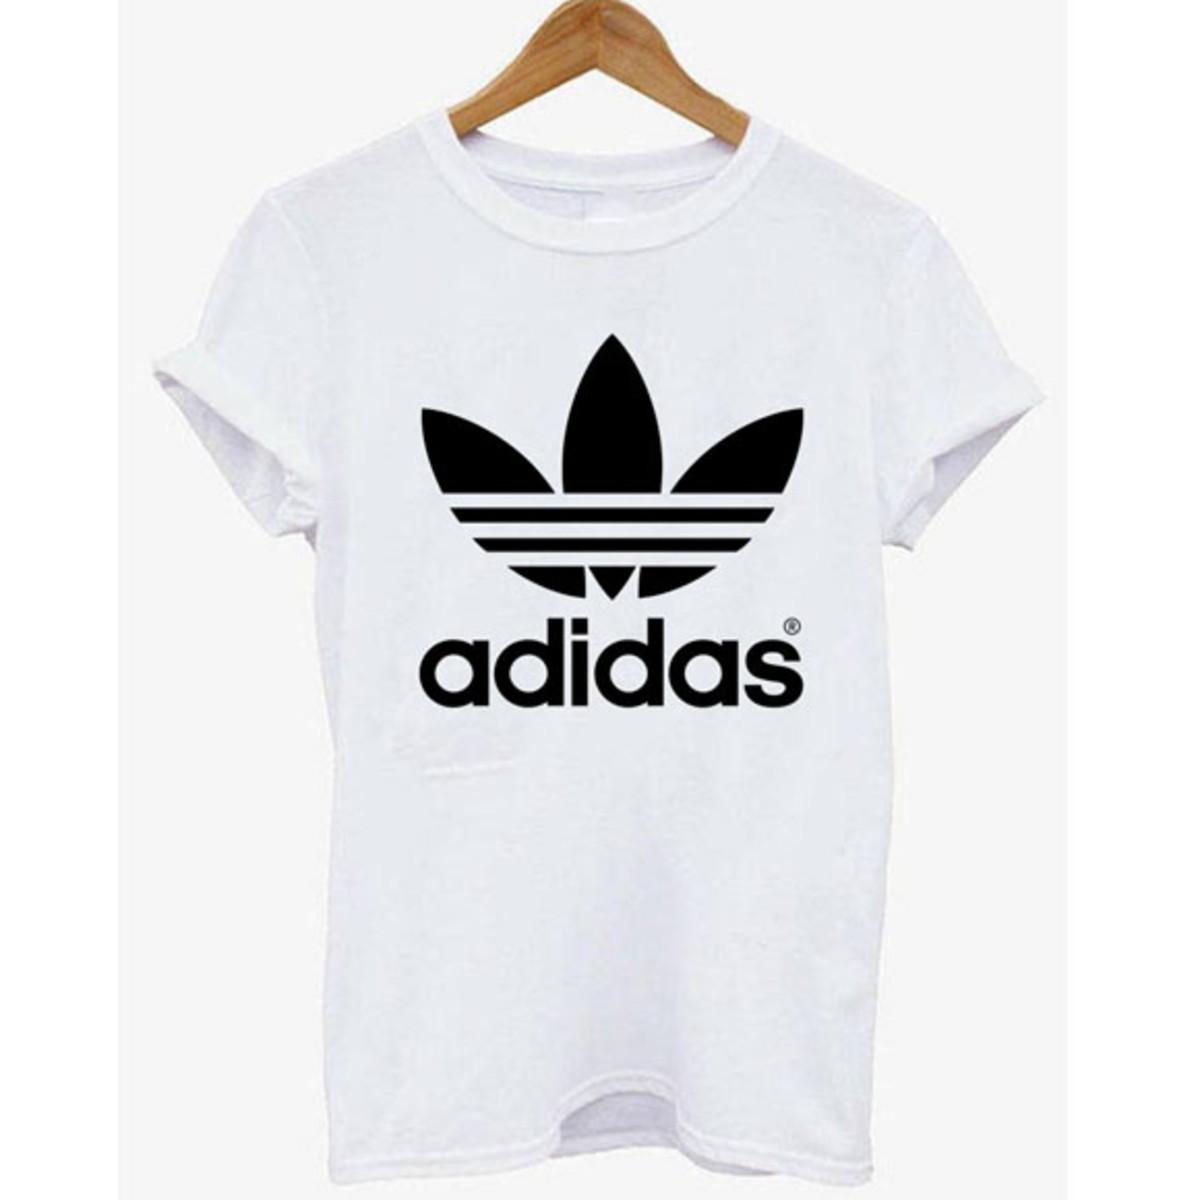 8c8b82366f6 Camisa Adidas Feminina Branca no Elo7